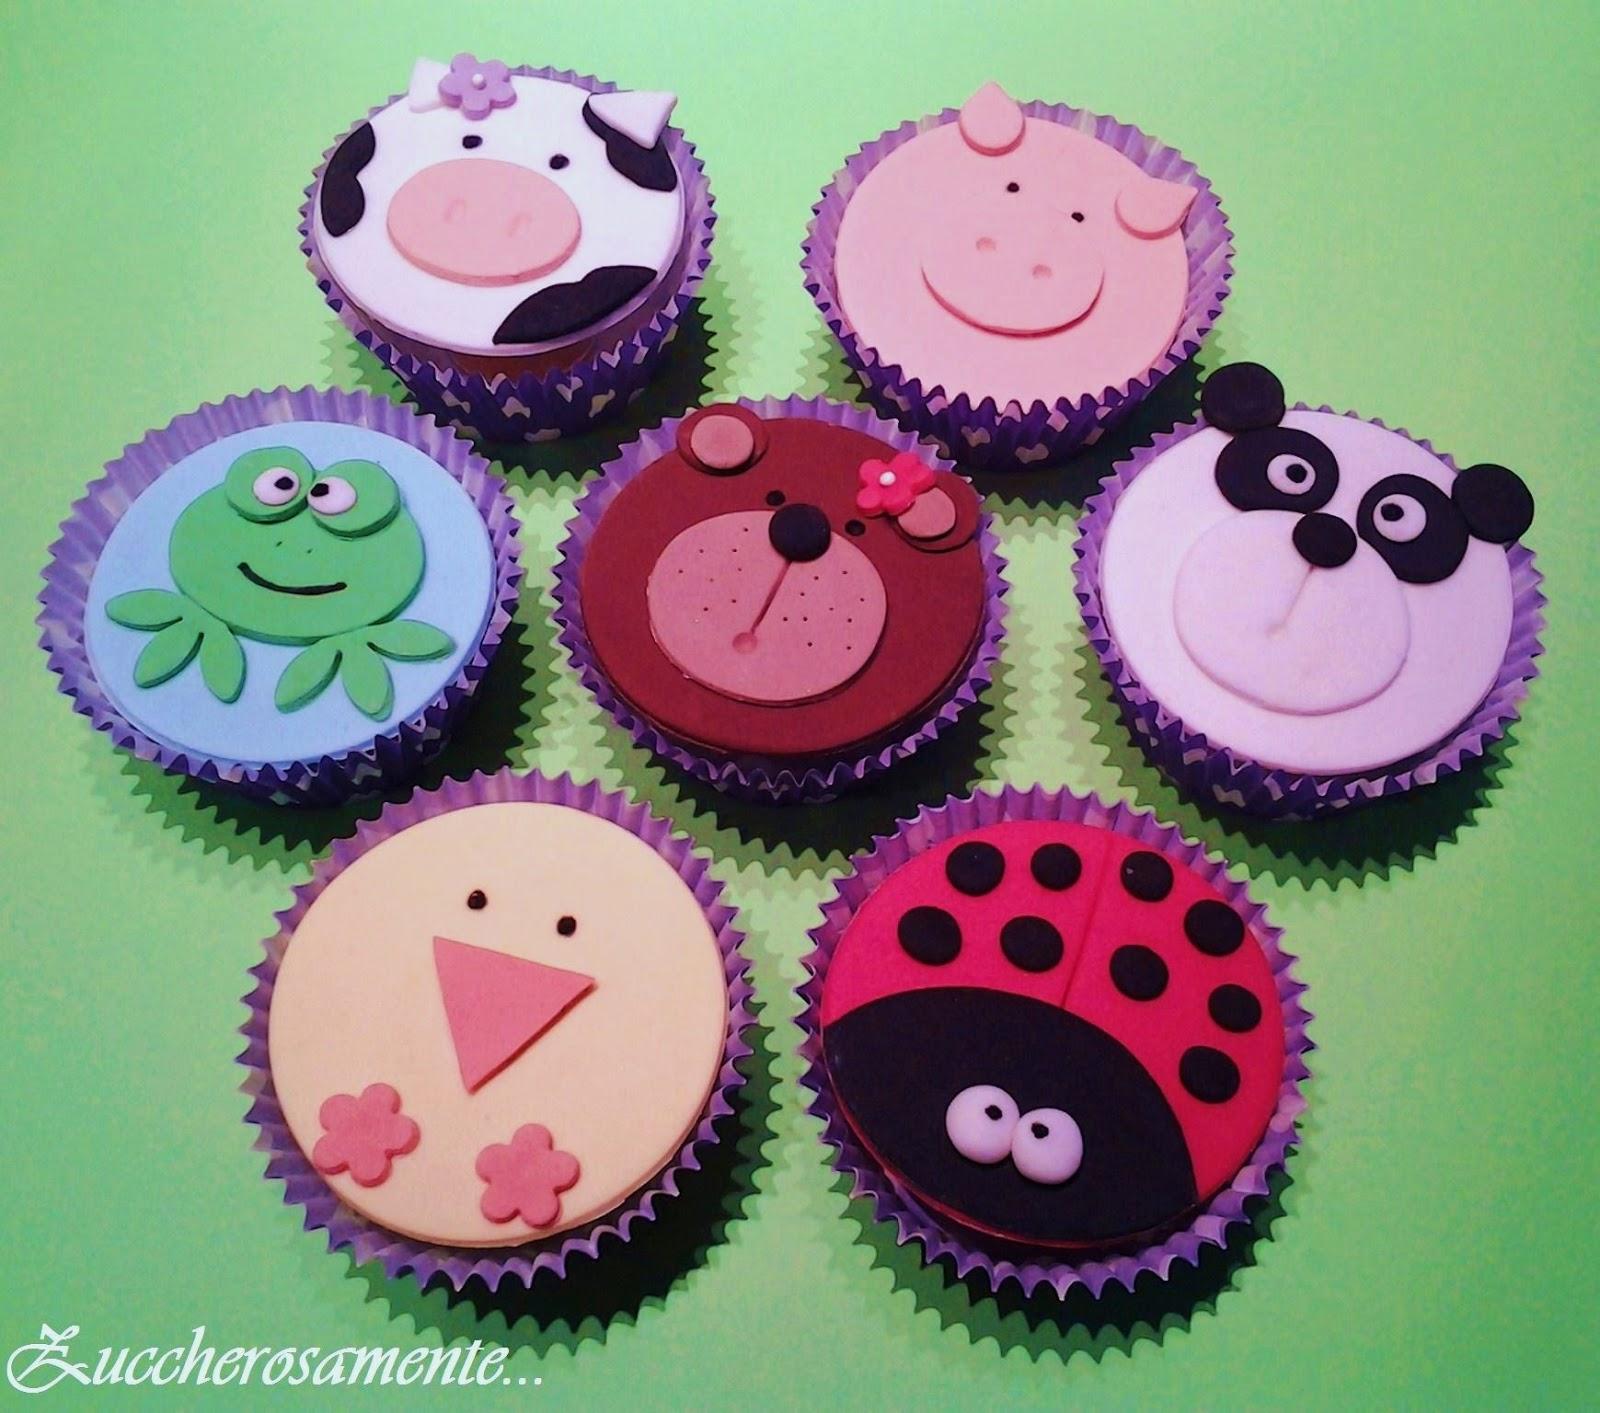 Zuccherosamente animals cupcakes corso di cake - Accessori per cake design ...